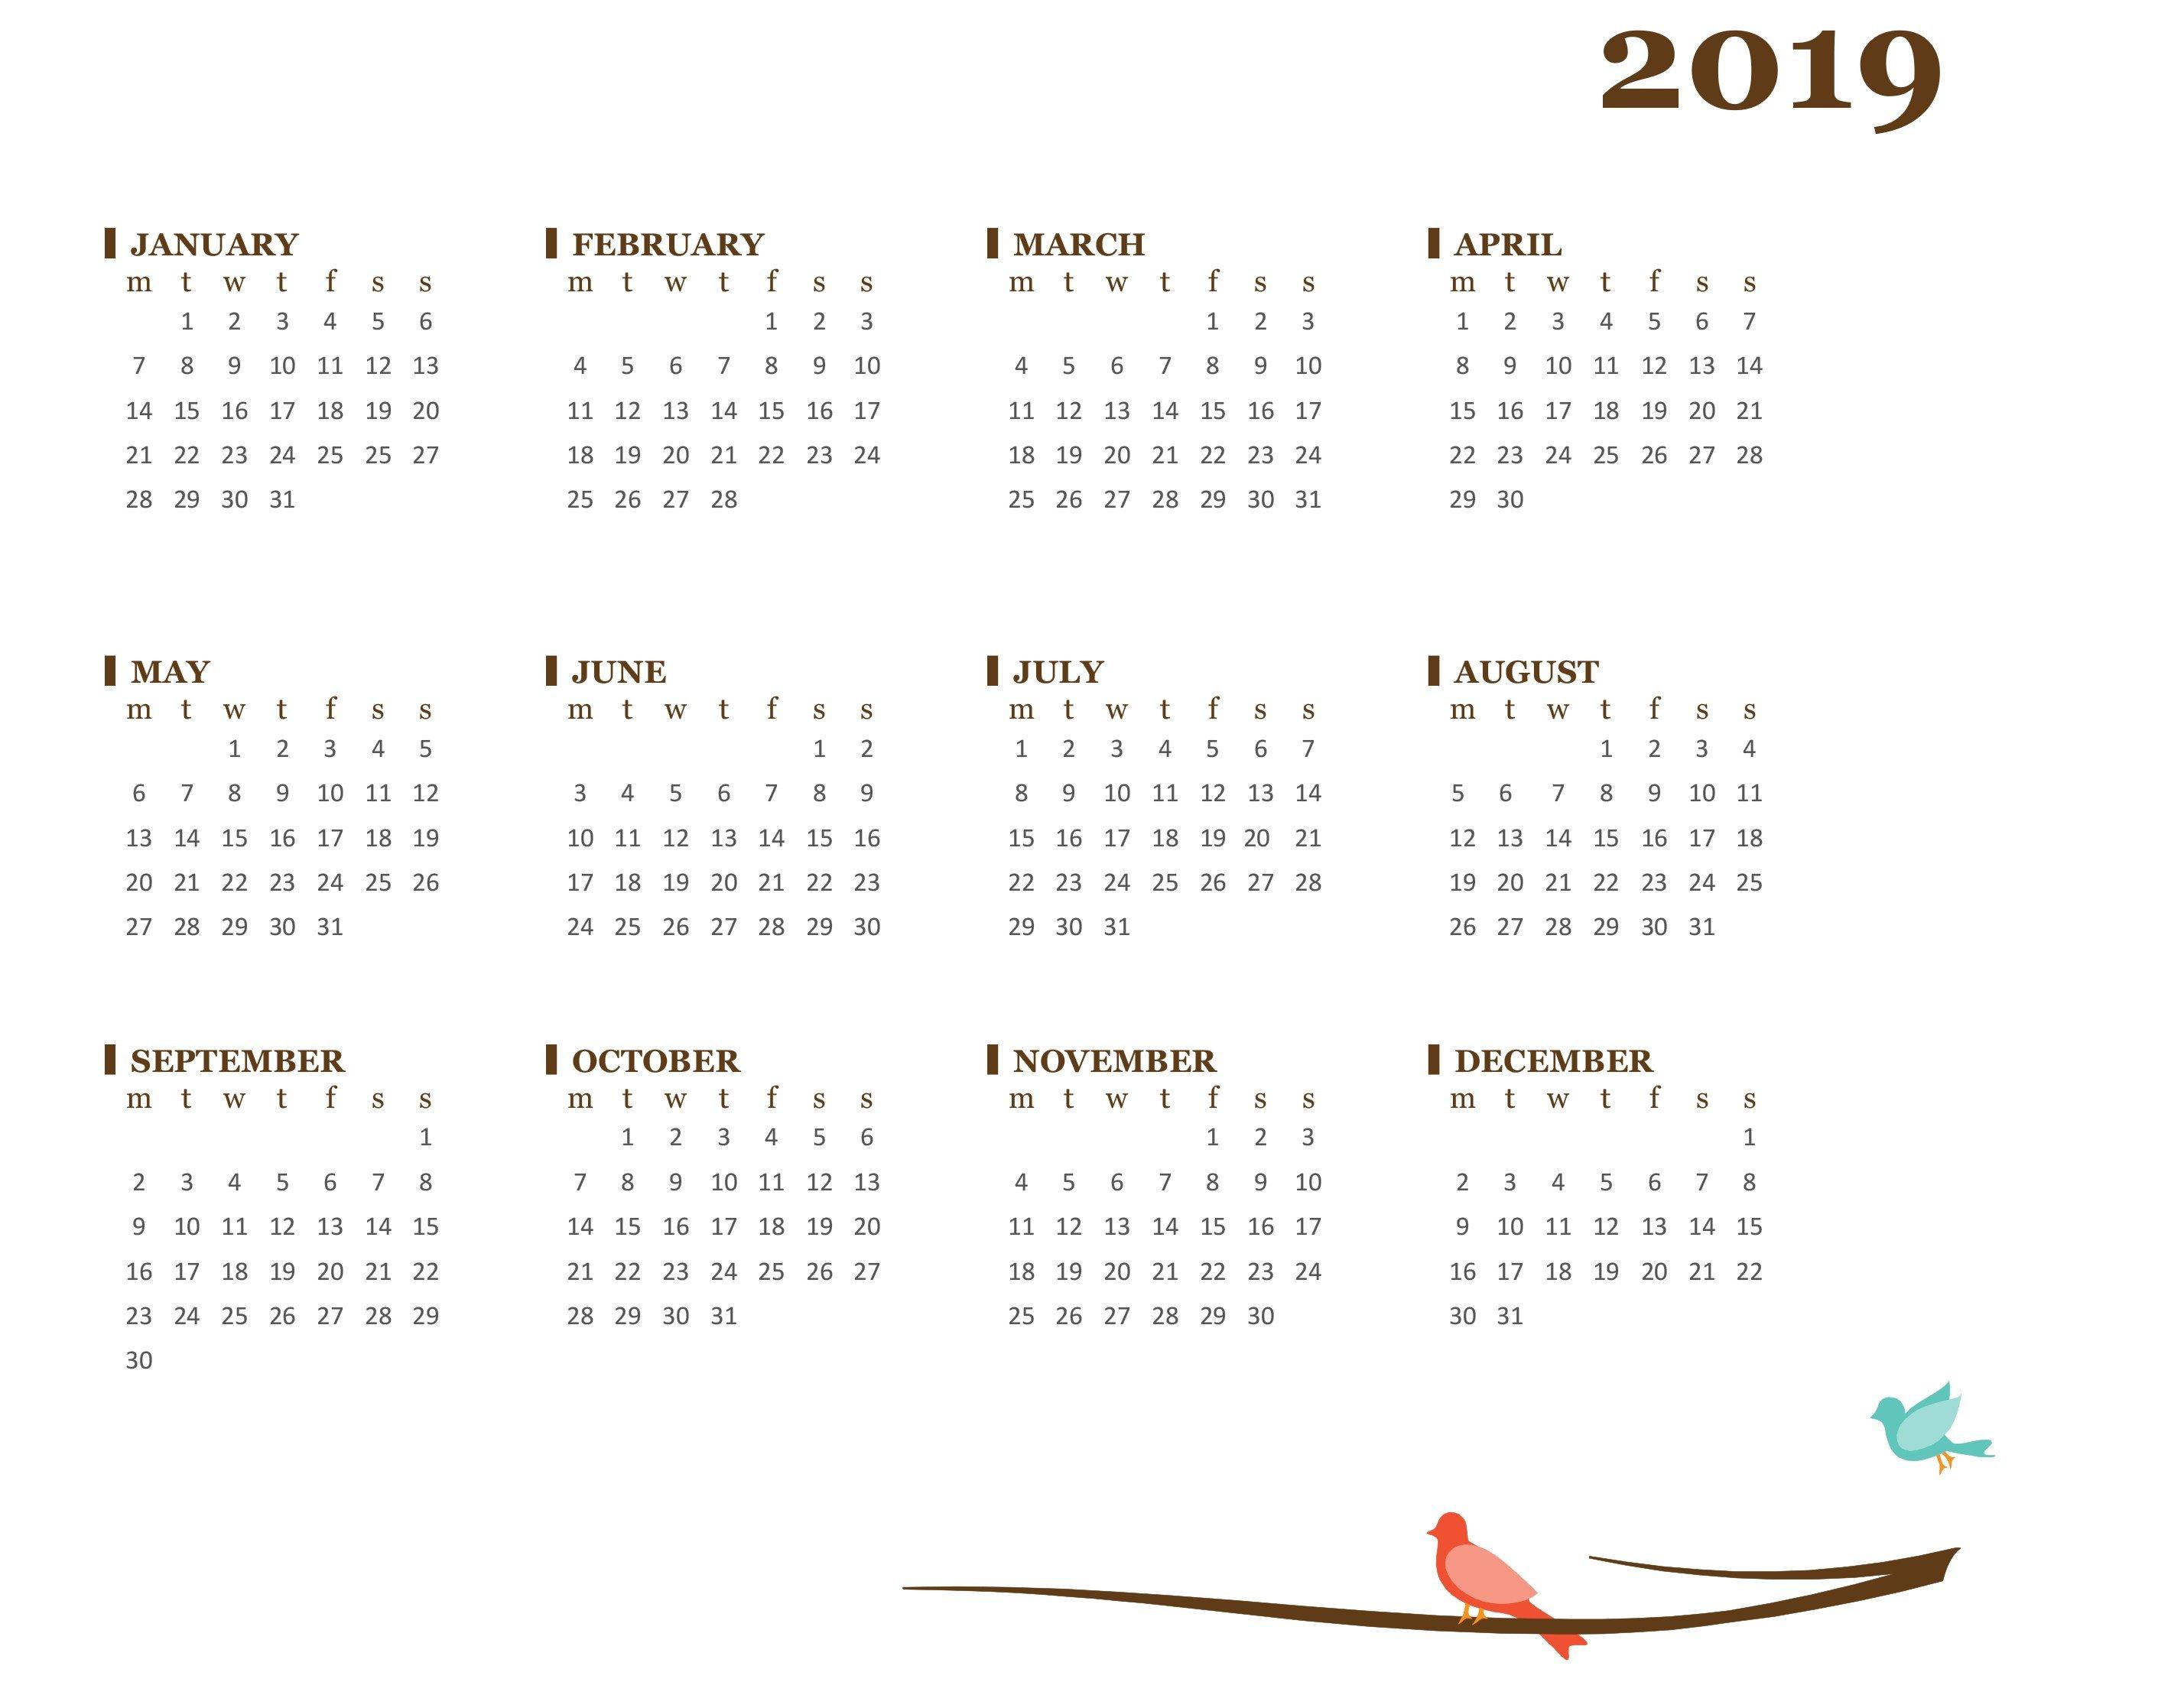 2019 Yearly Calendar (Mon Sun) Calendar En 8 2019